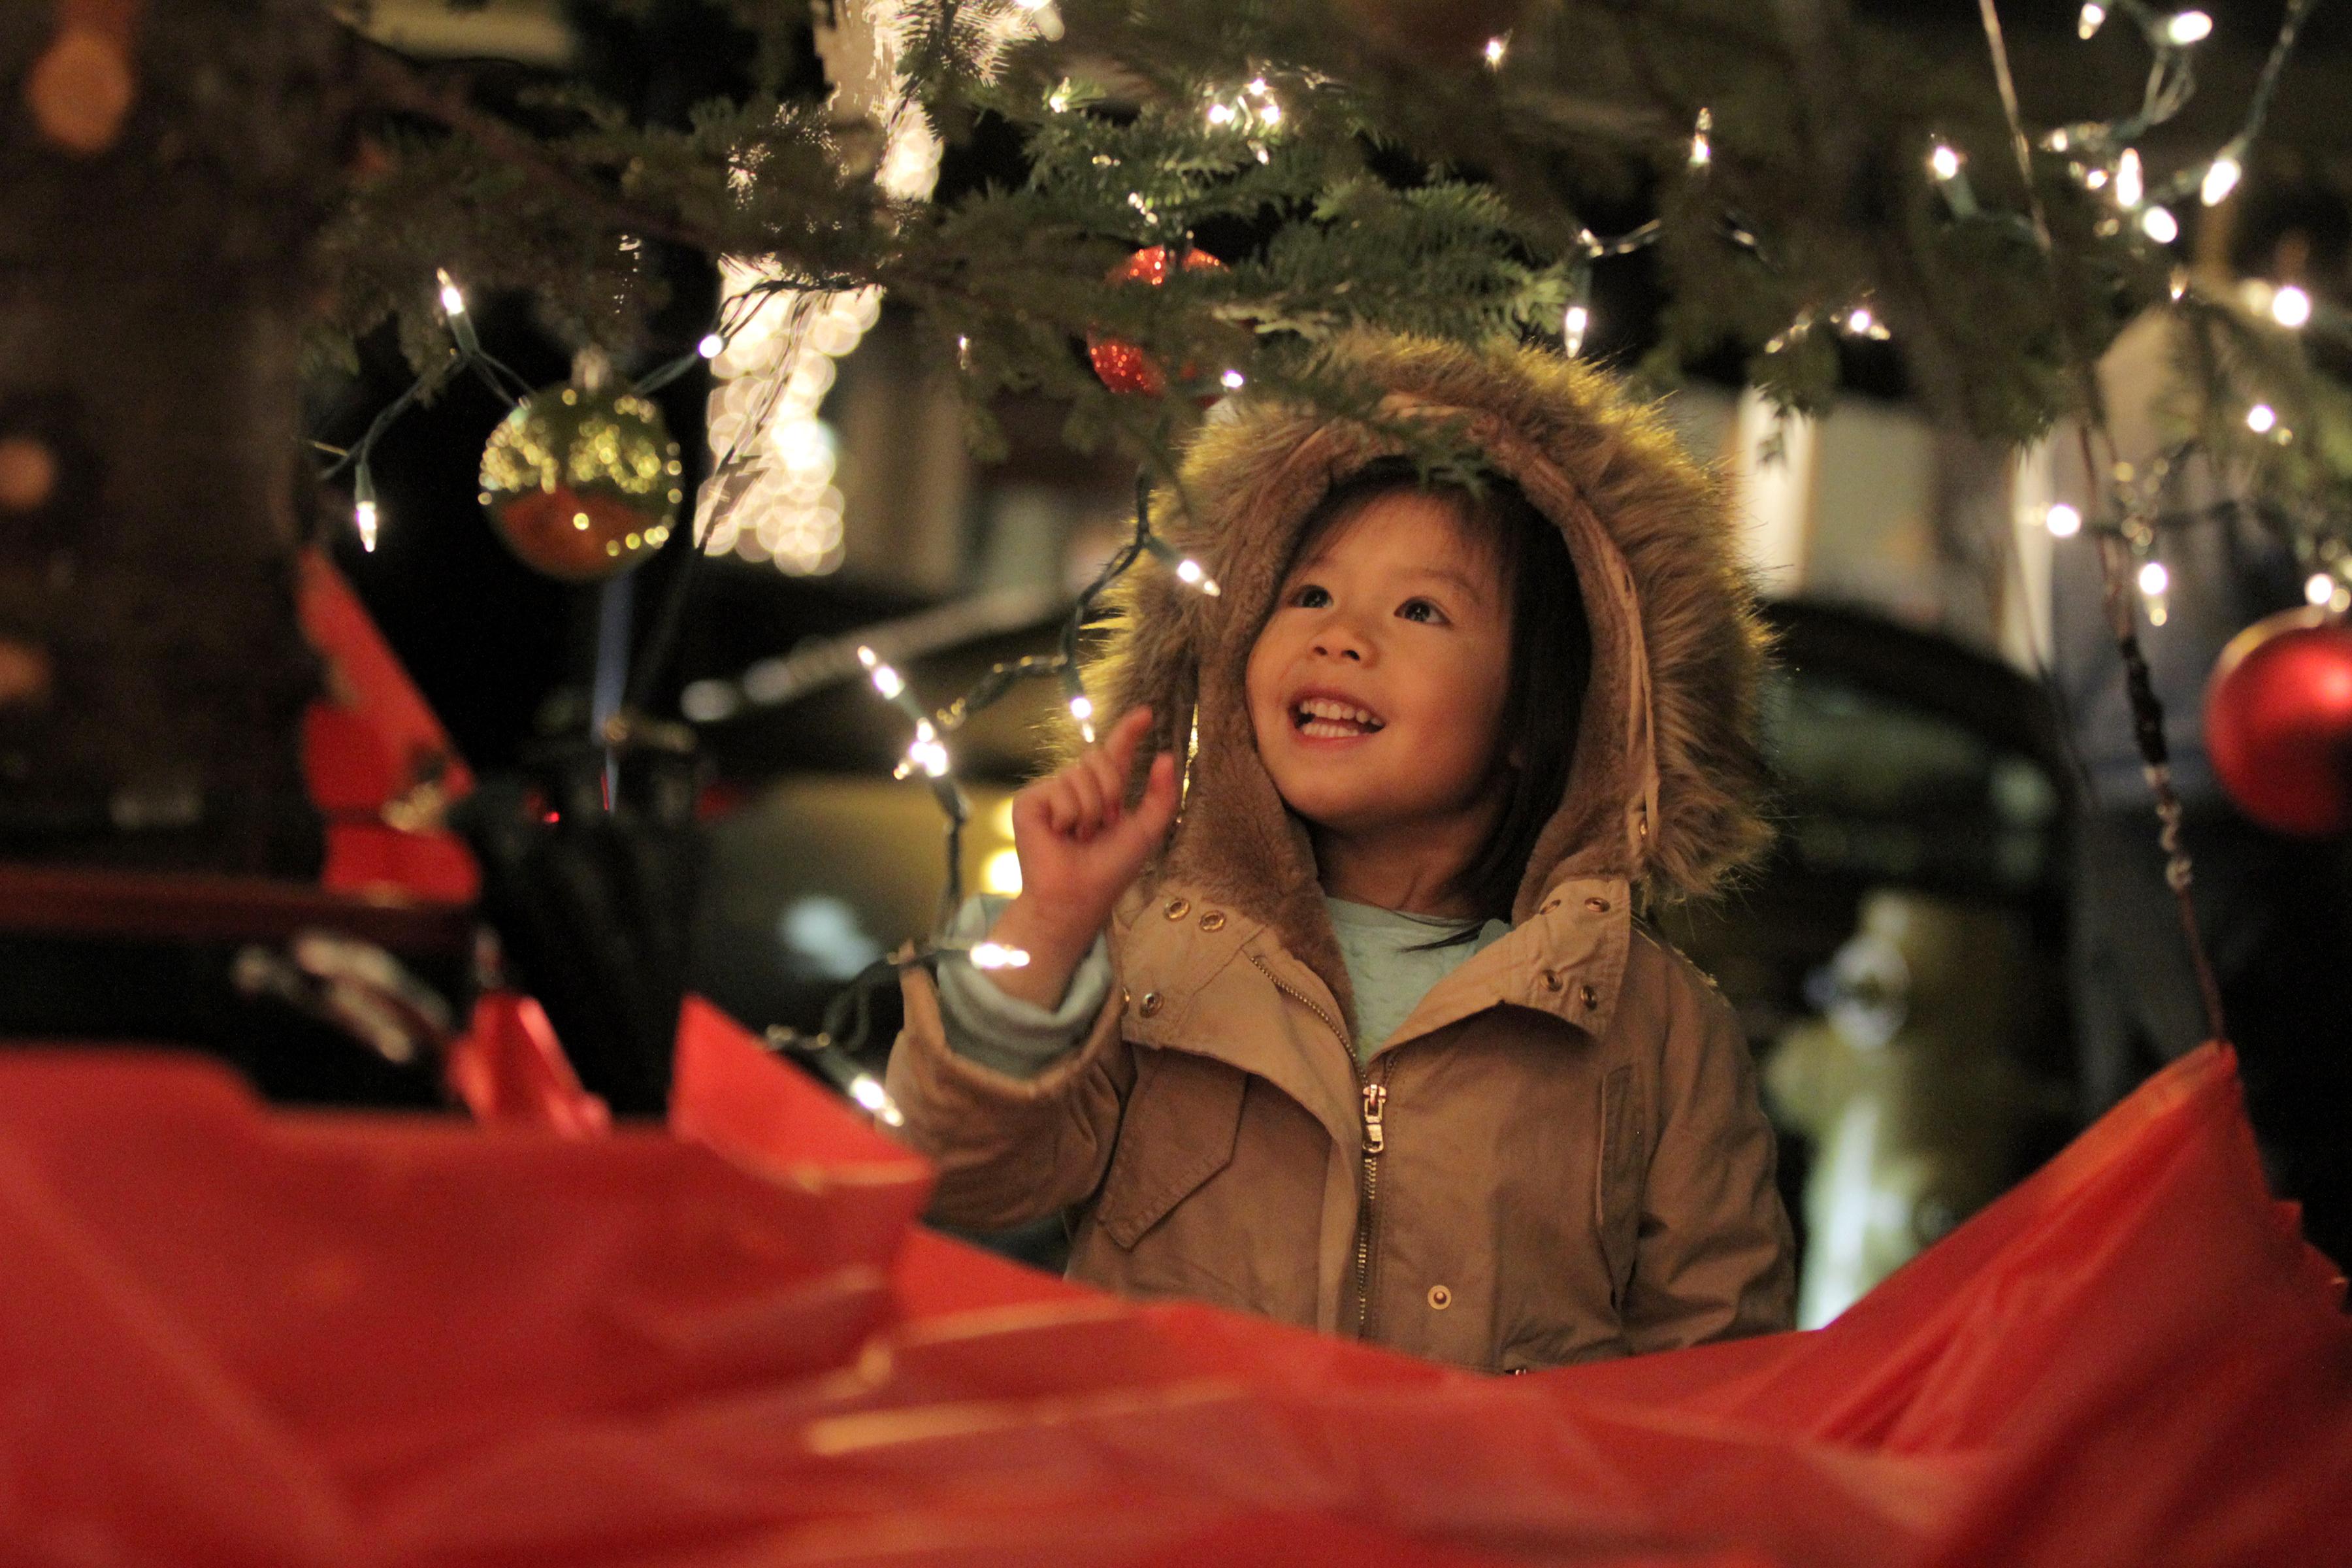 Los Altos Holiday tree lighting